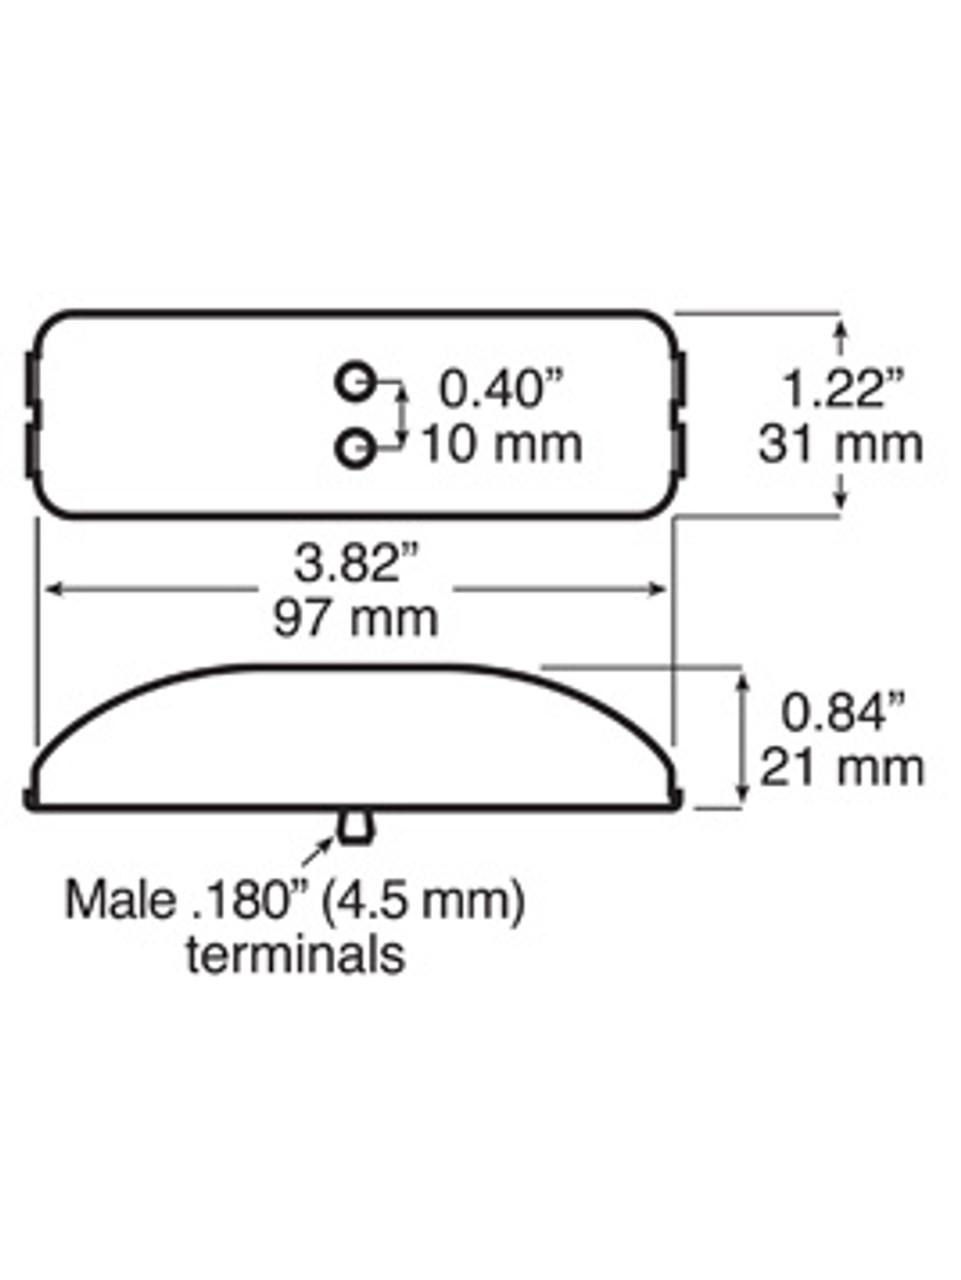 LED154KA-R --- LED Combinational Marker Light Kit